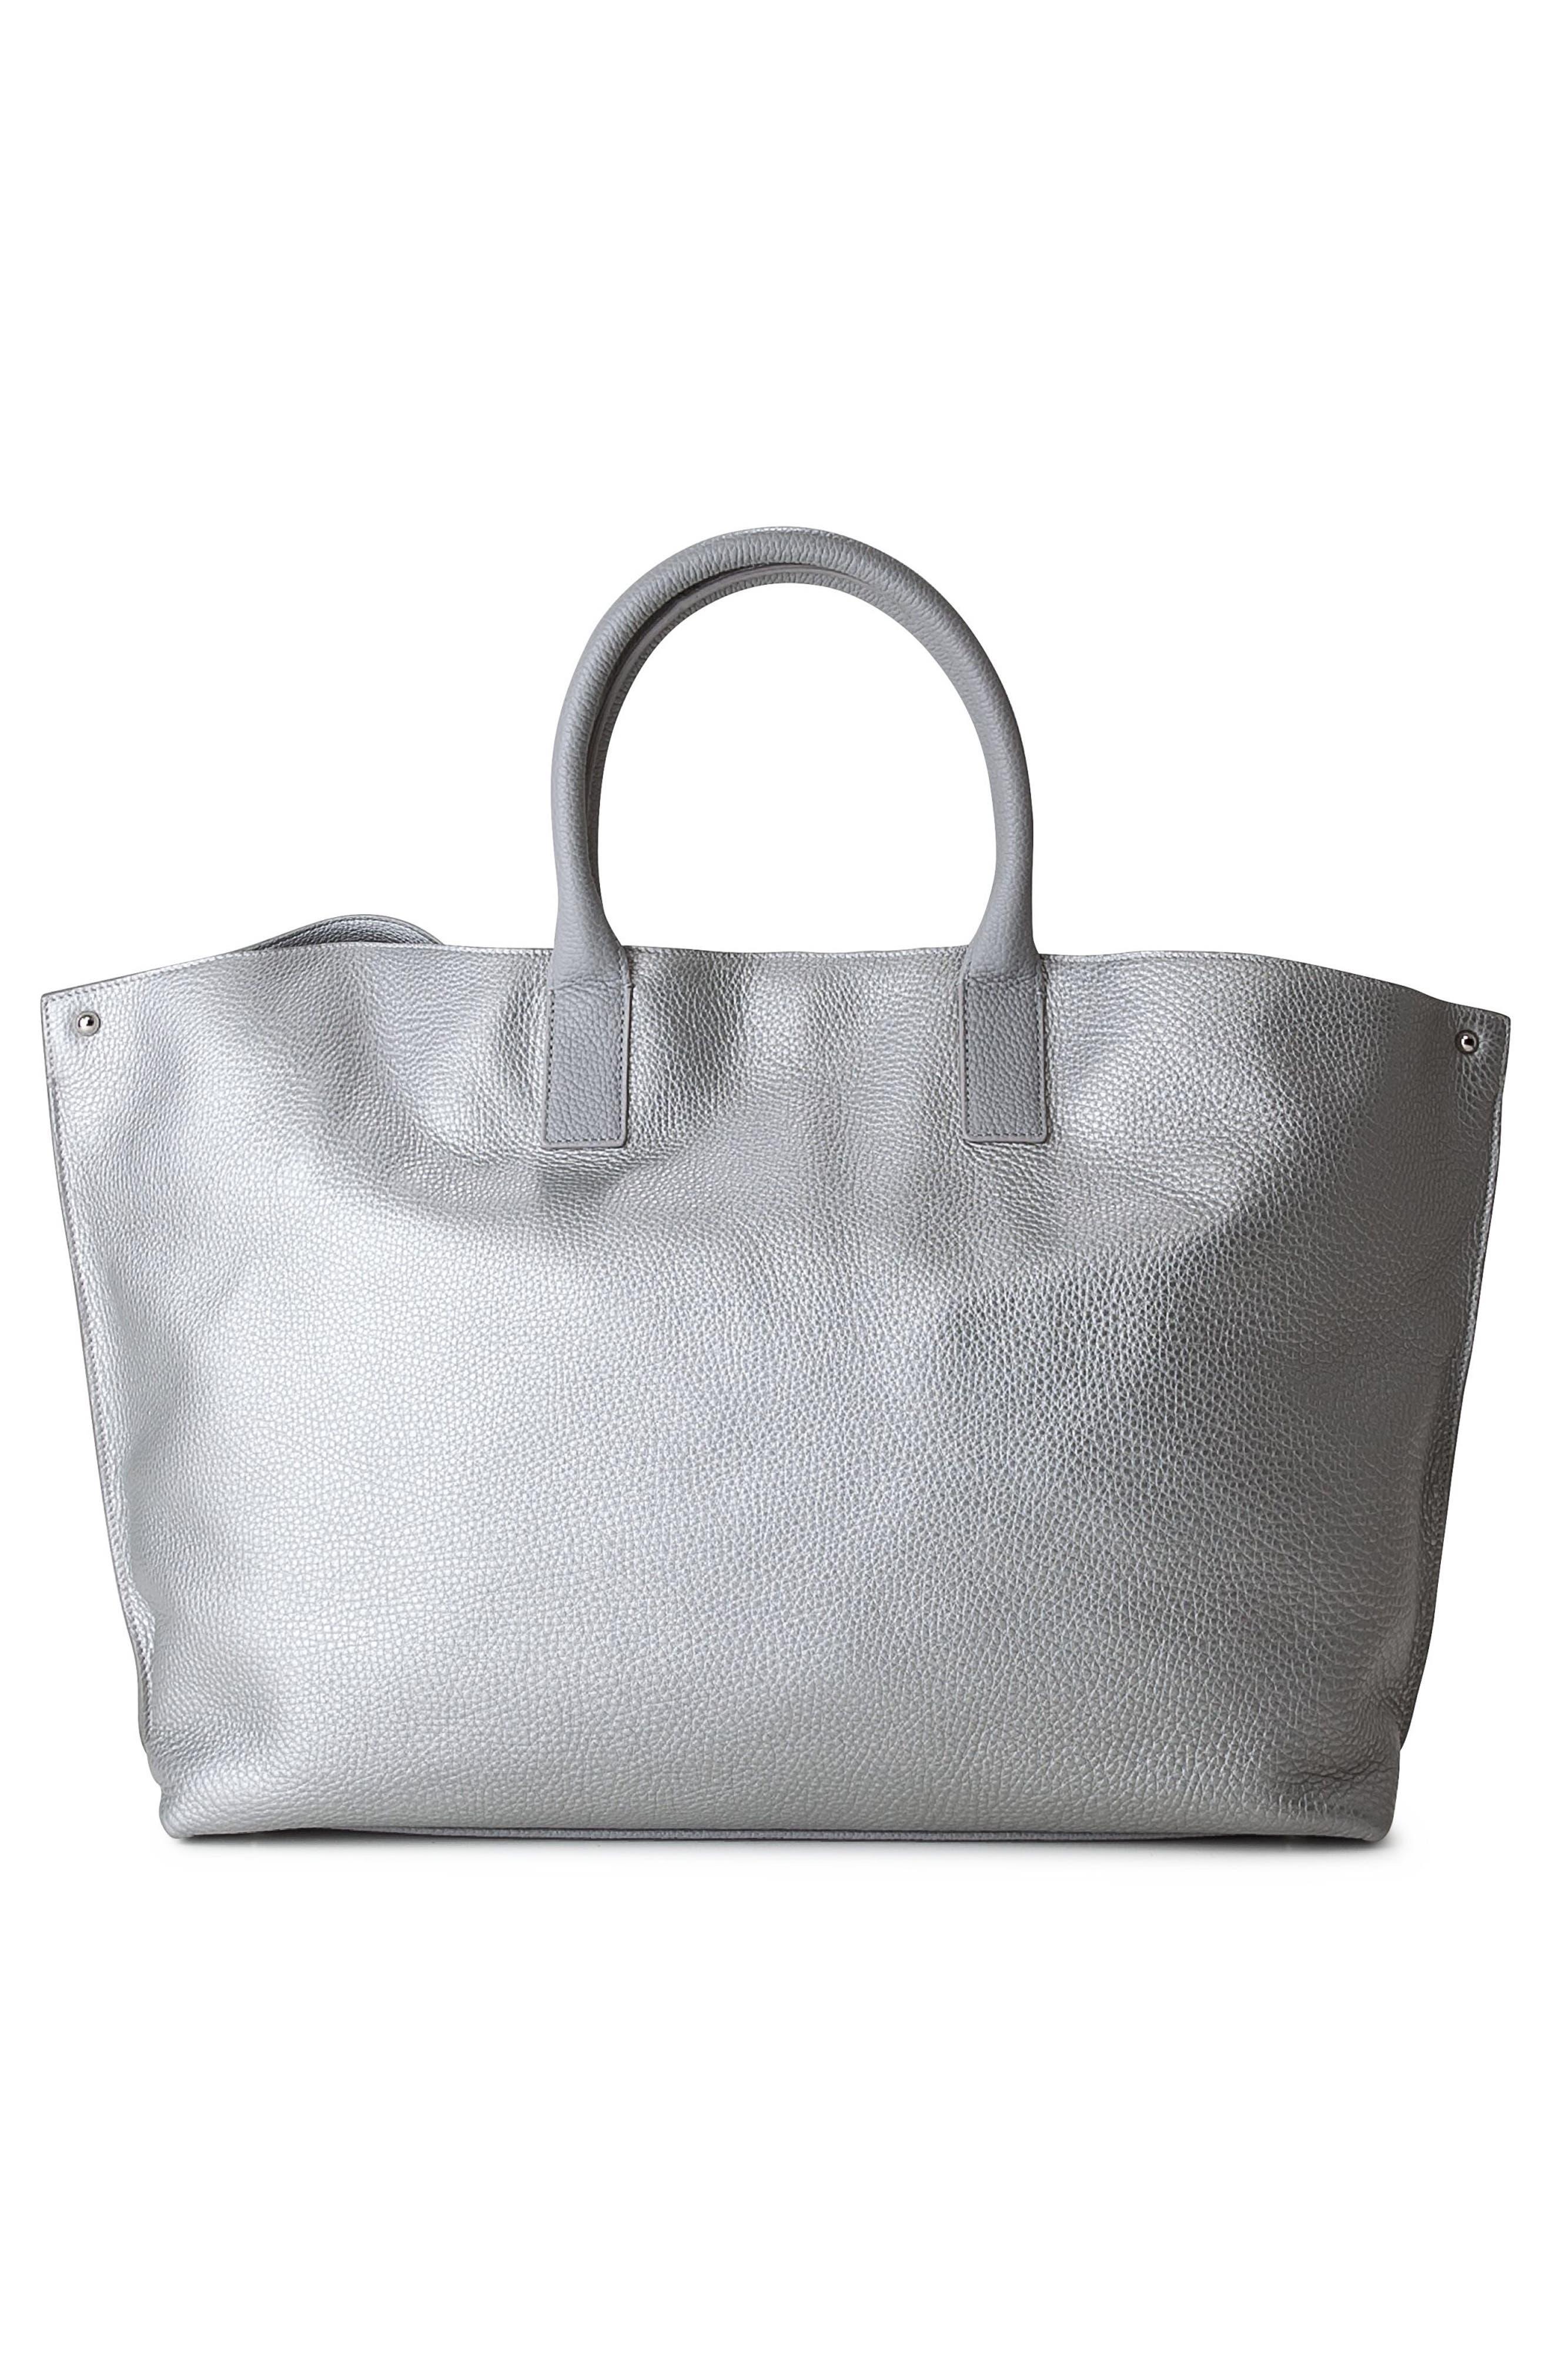 'AI Medium Messenger' Tricolor Leather Tote,                             Alternate thumbnail 4, color,                             Marmo/ White/ Light Silver